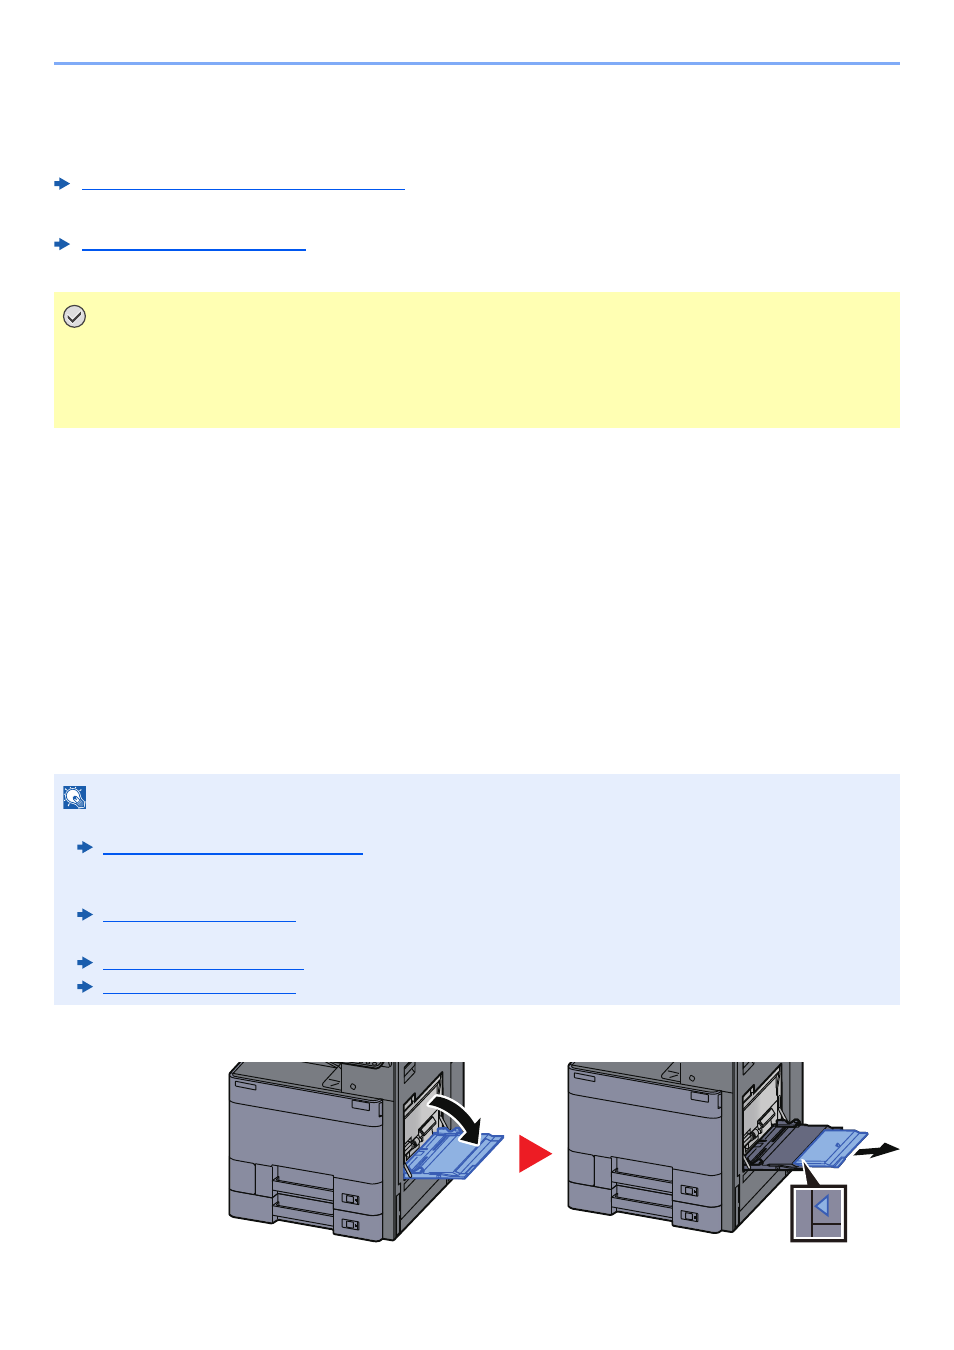 Loading paper in the multi purpose tray, Loading paper in the multi